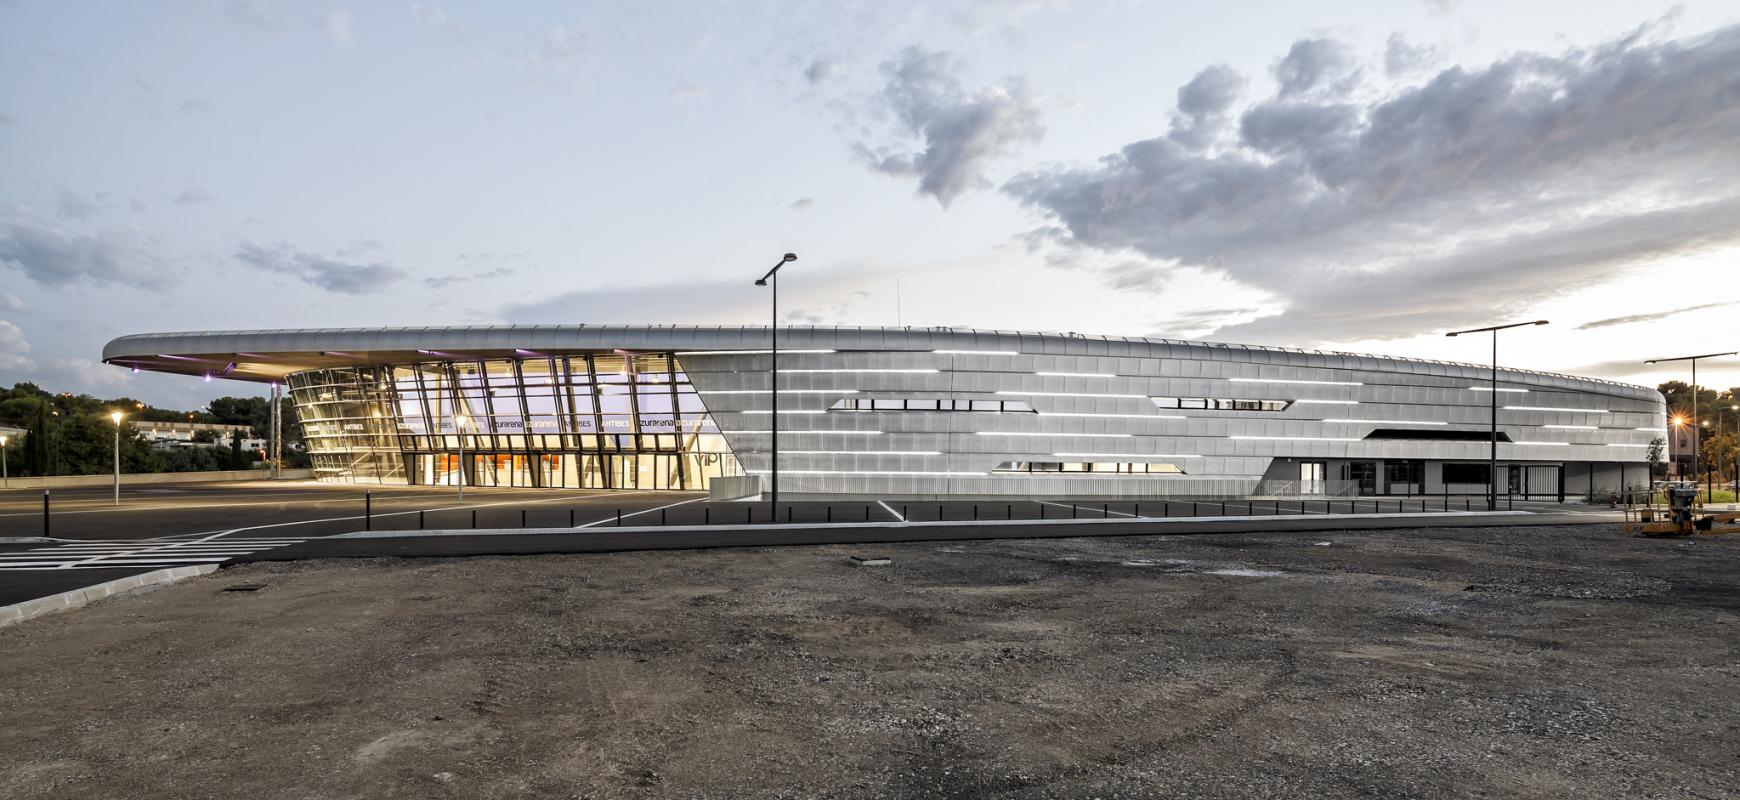 Vue panoramique de la salle omnisports Azur Arena à Antibes.